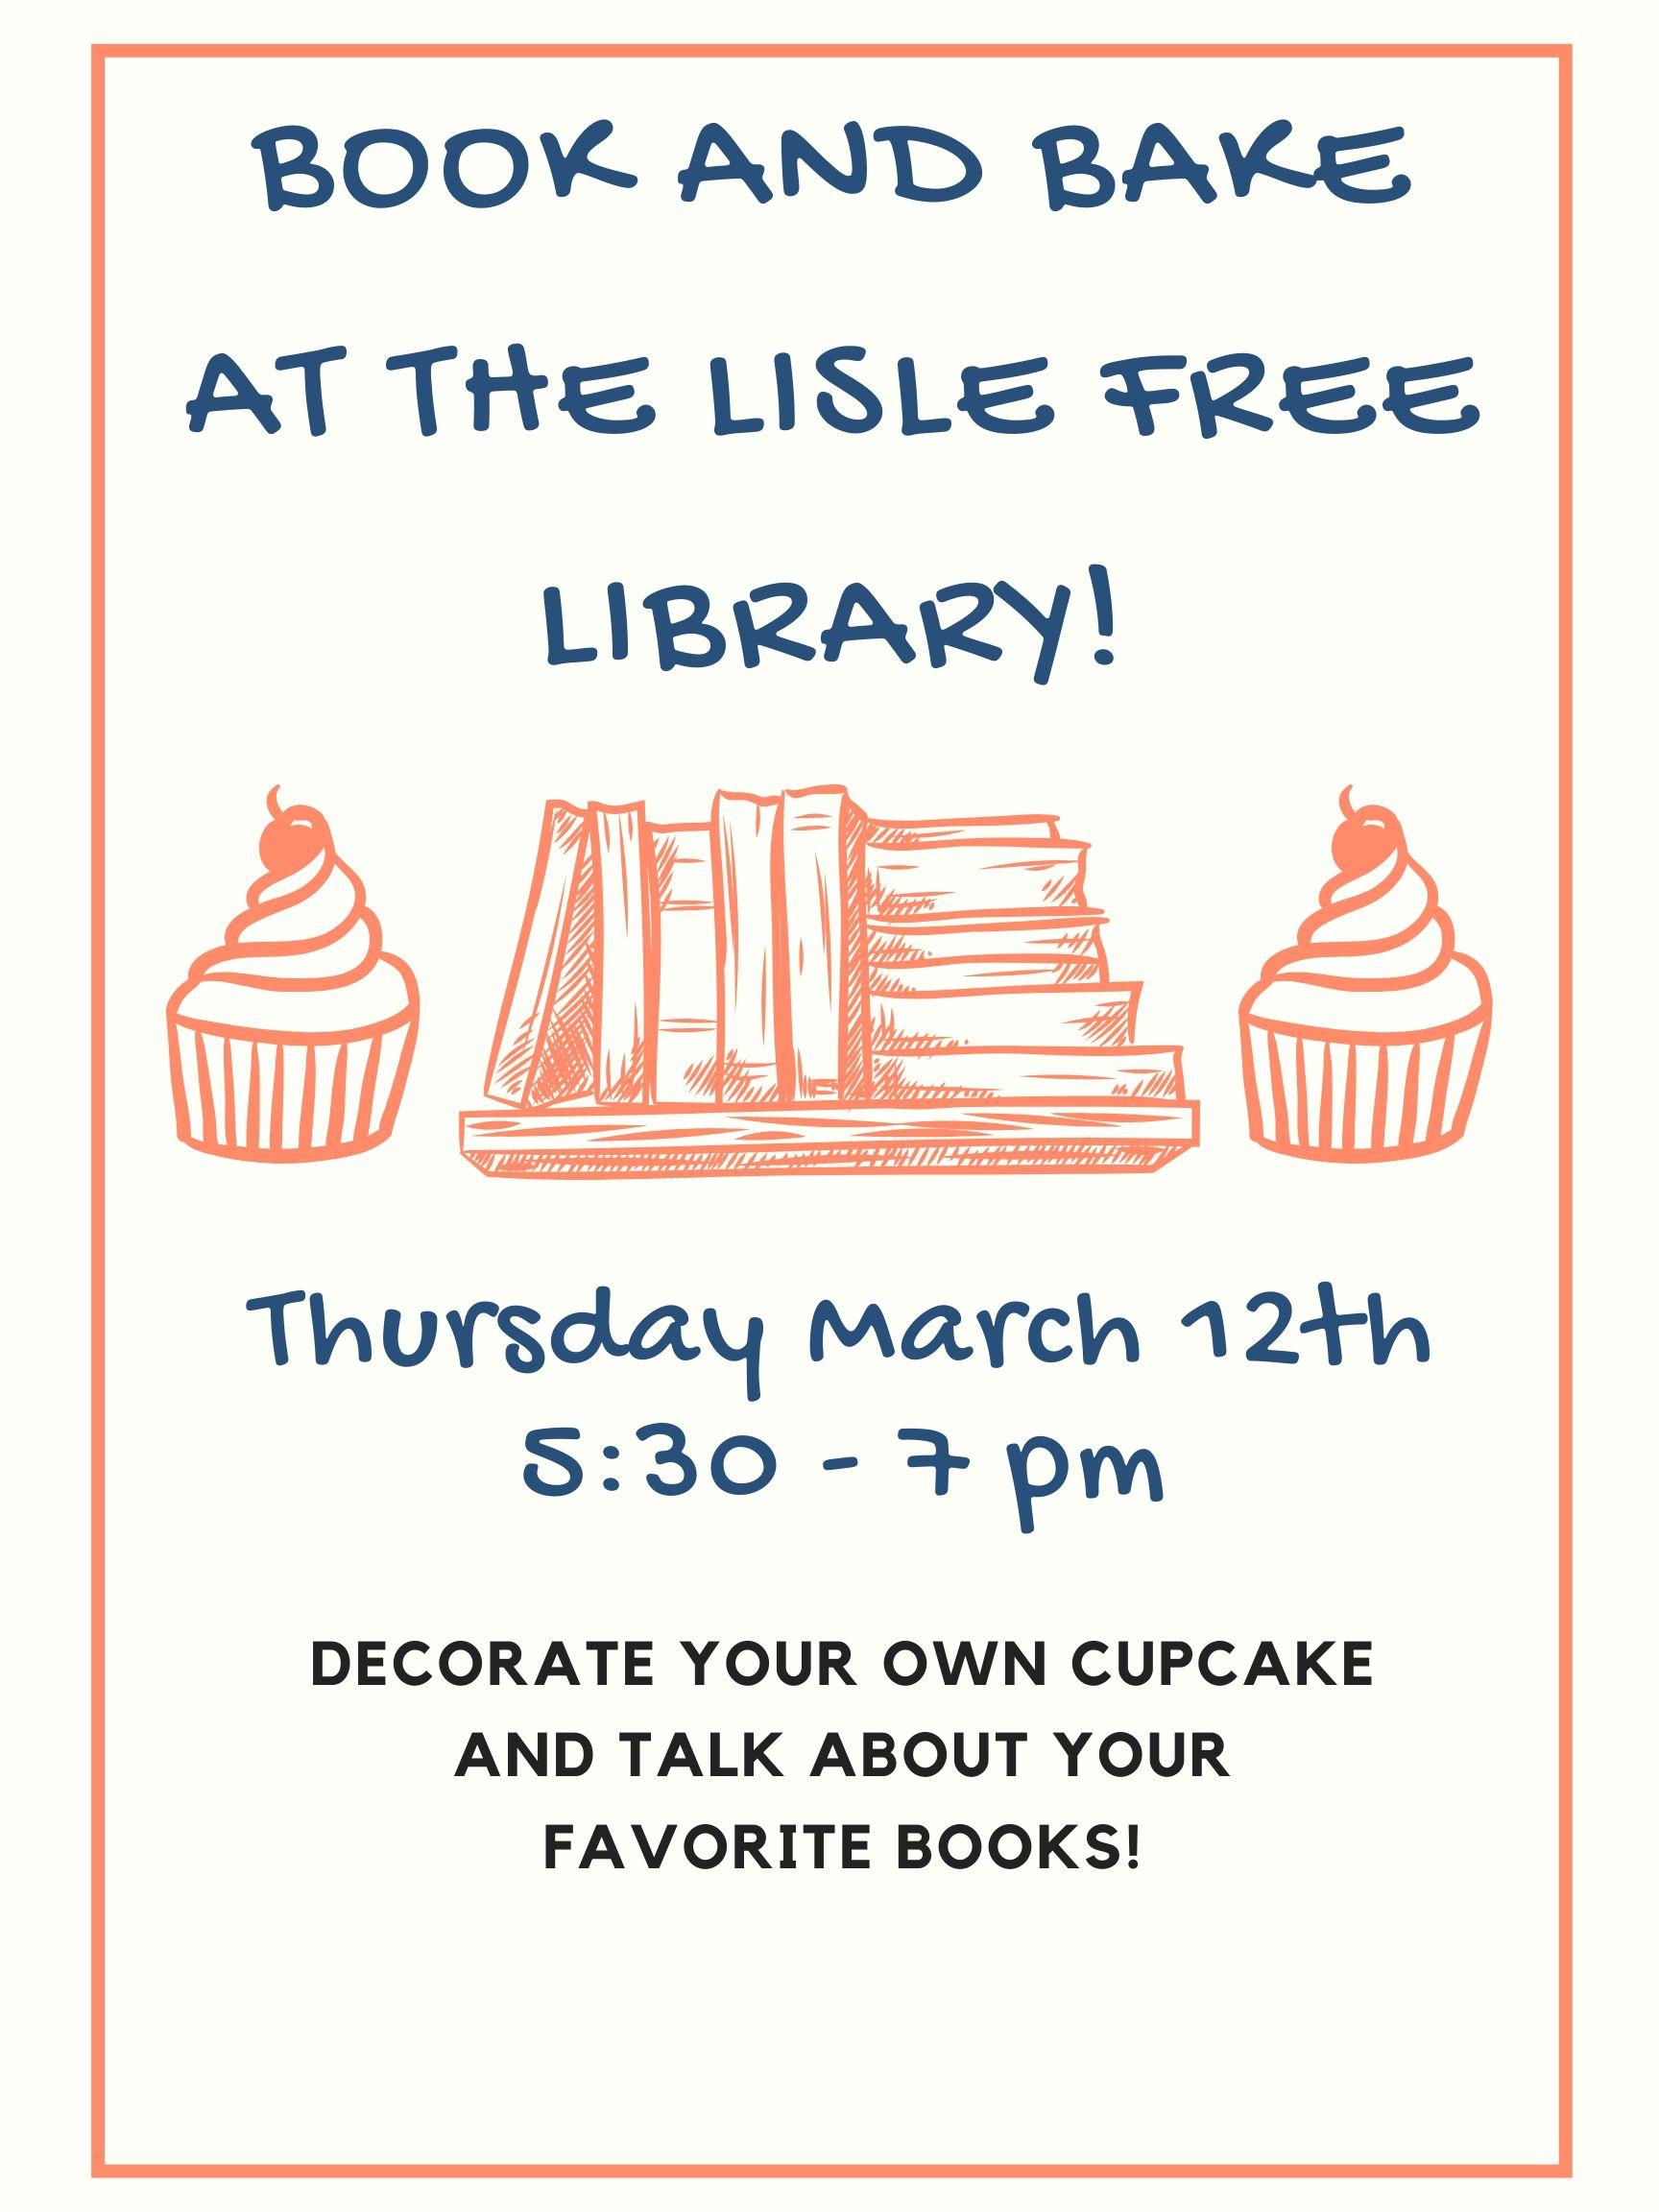 Book & Bake (w/ Cupcakes!)